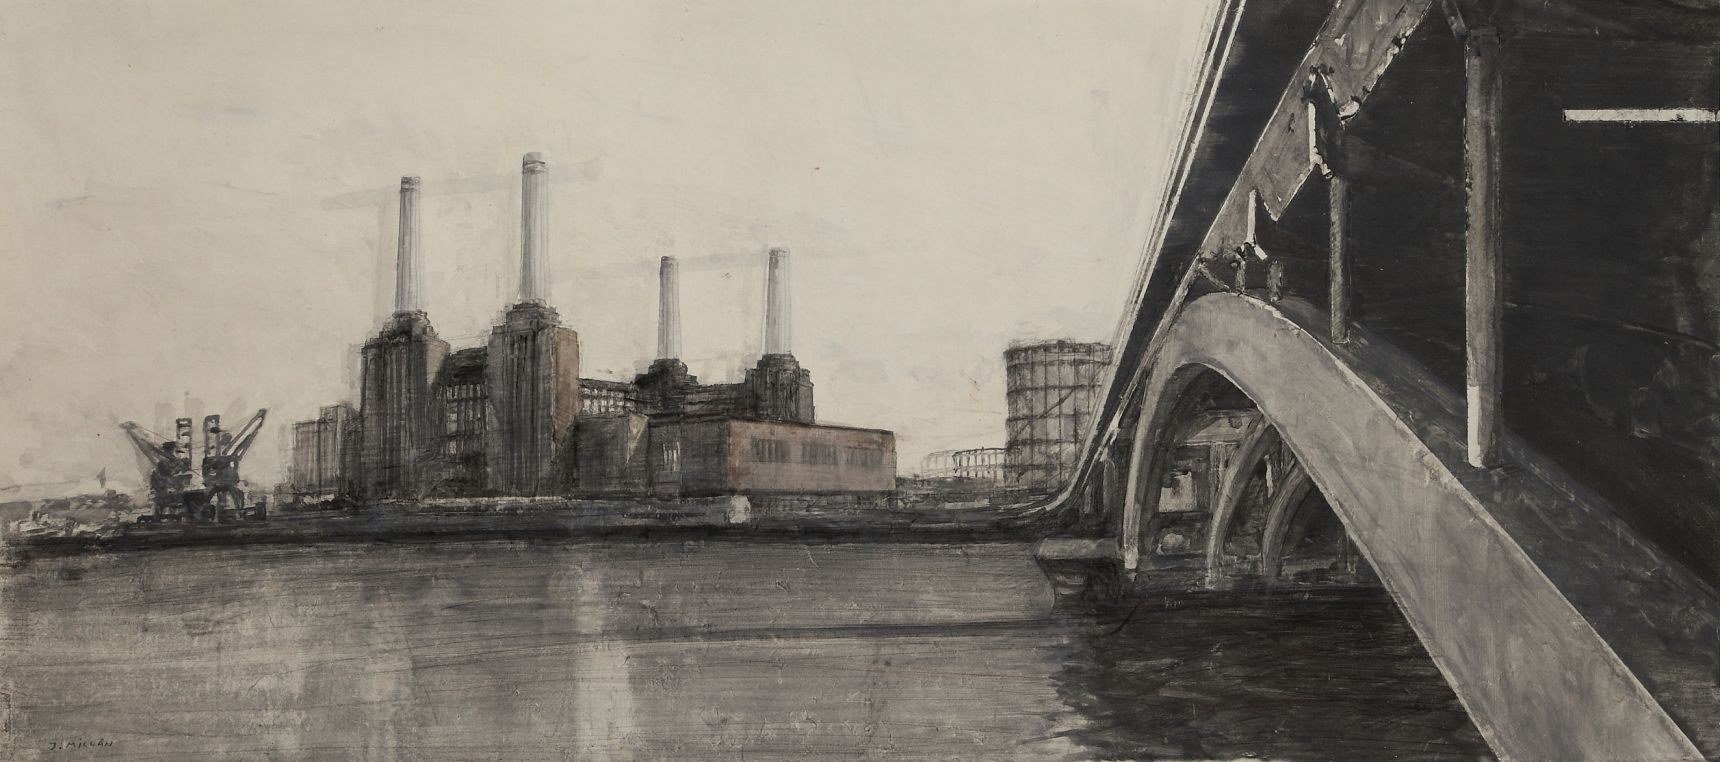 Battersea Power Station Londres (2016) - Joaquín Millán